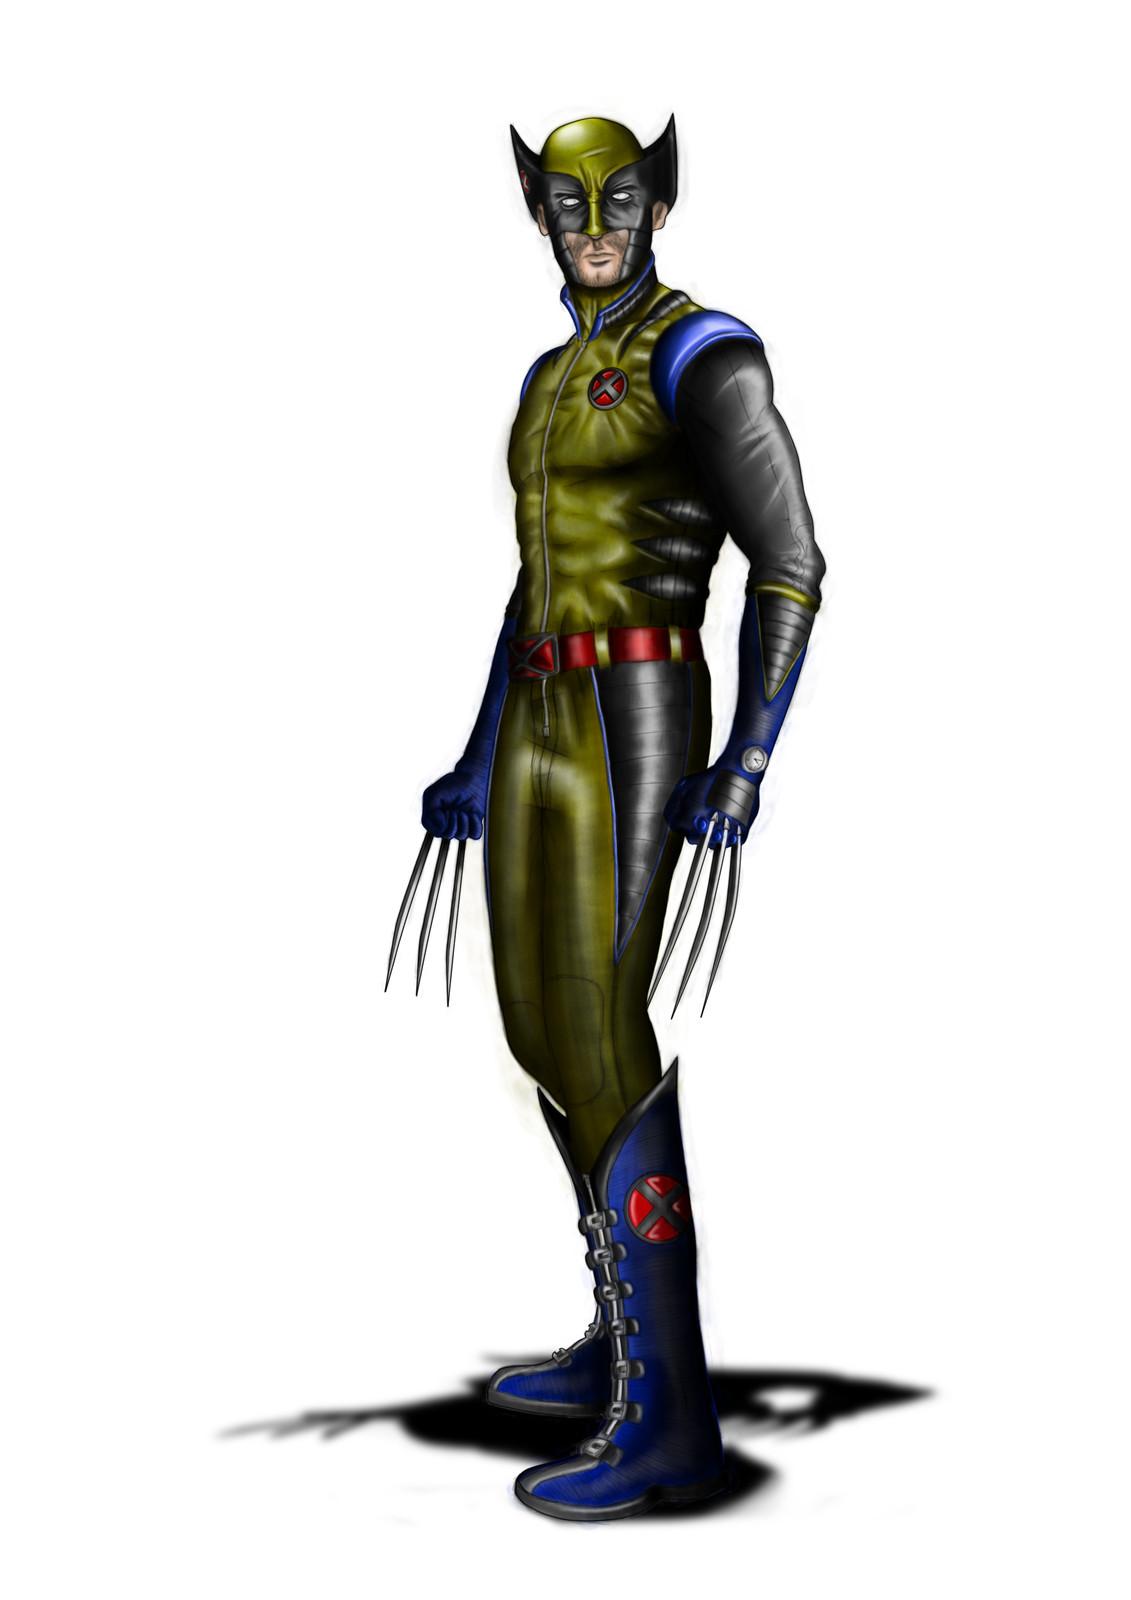 Wolverine (Hugh Jackman) Costume Redesign (2011)